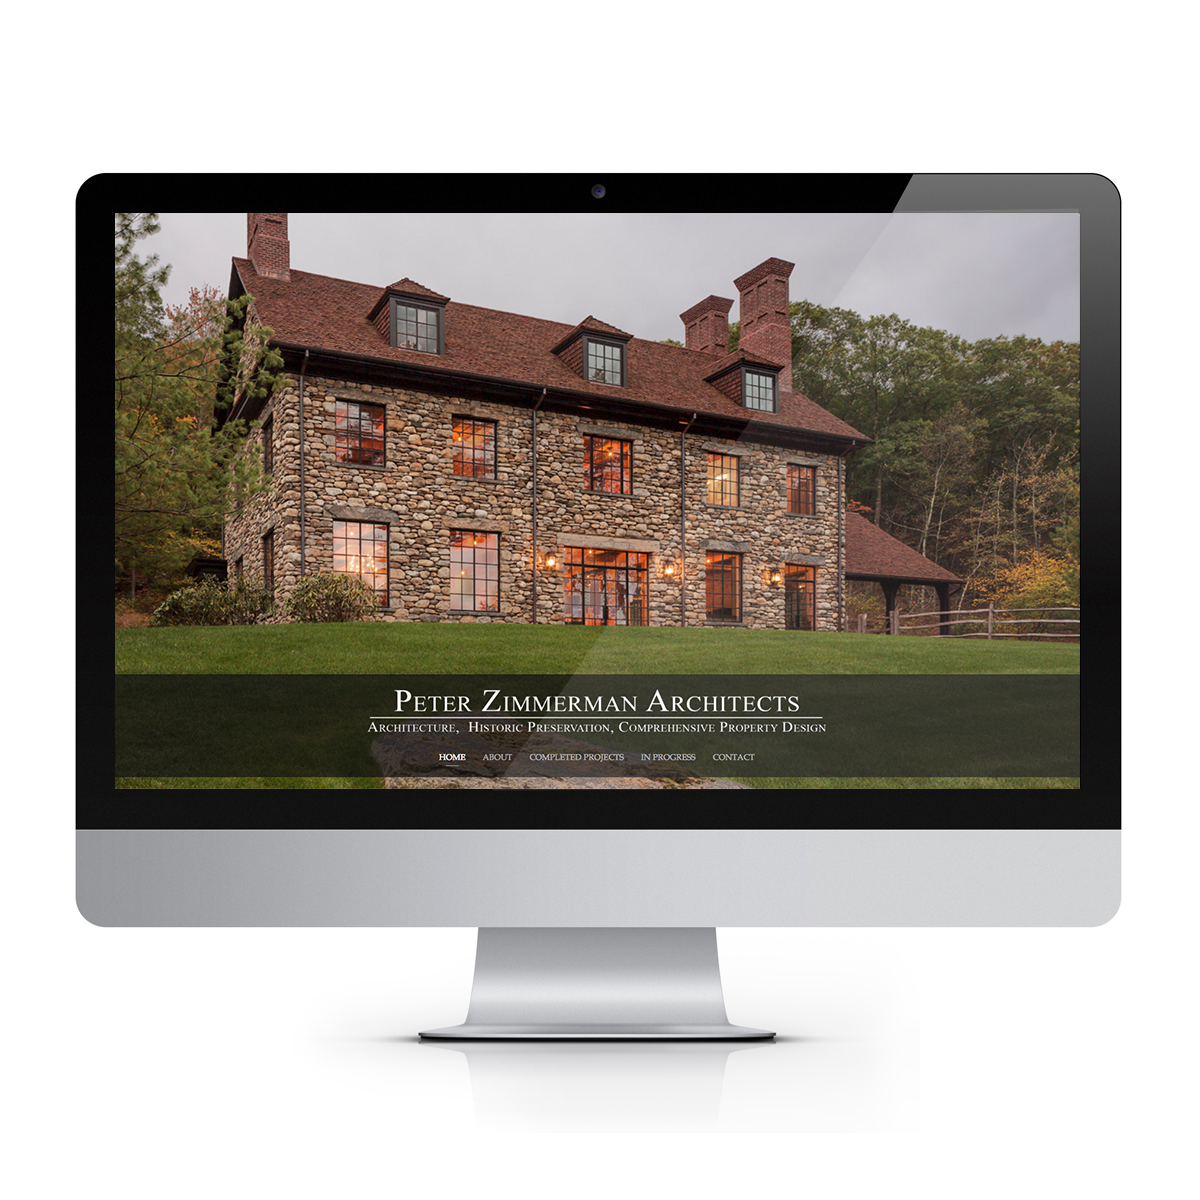 Peter Zimmerman Architects Website